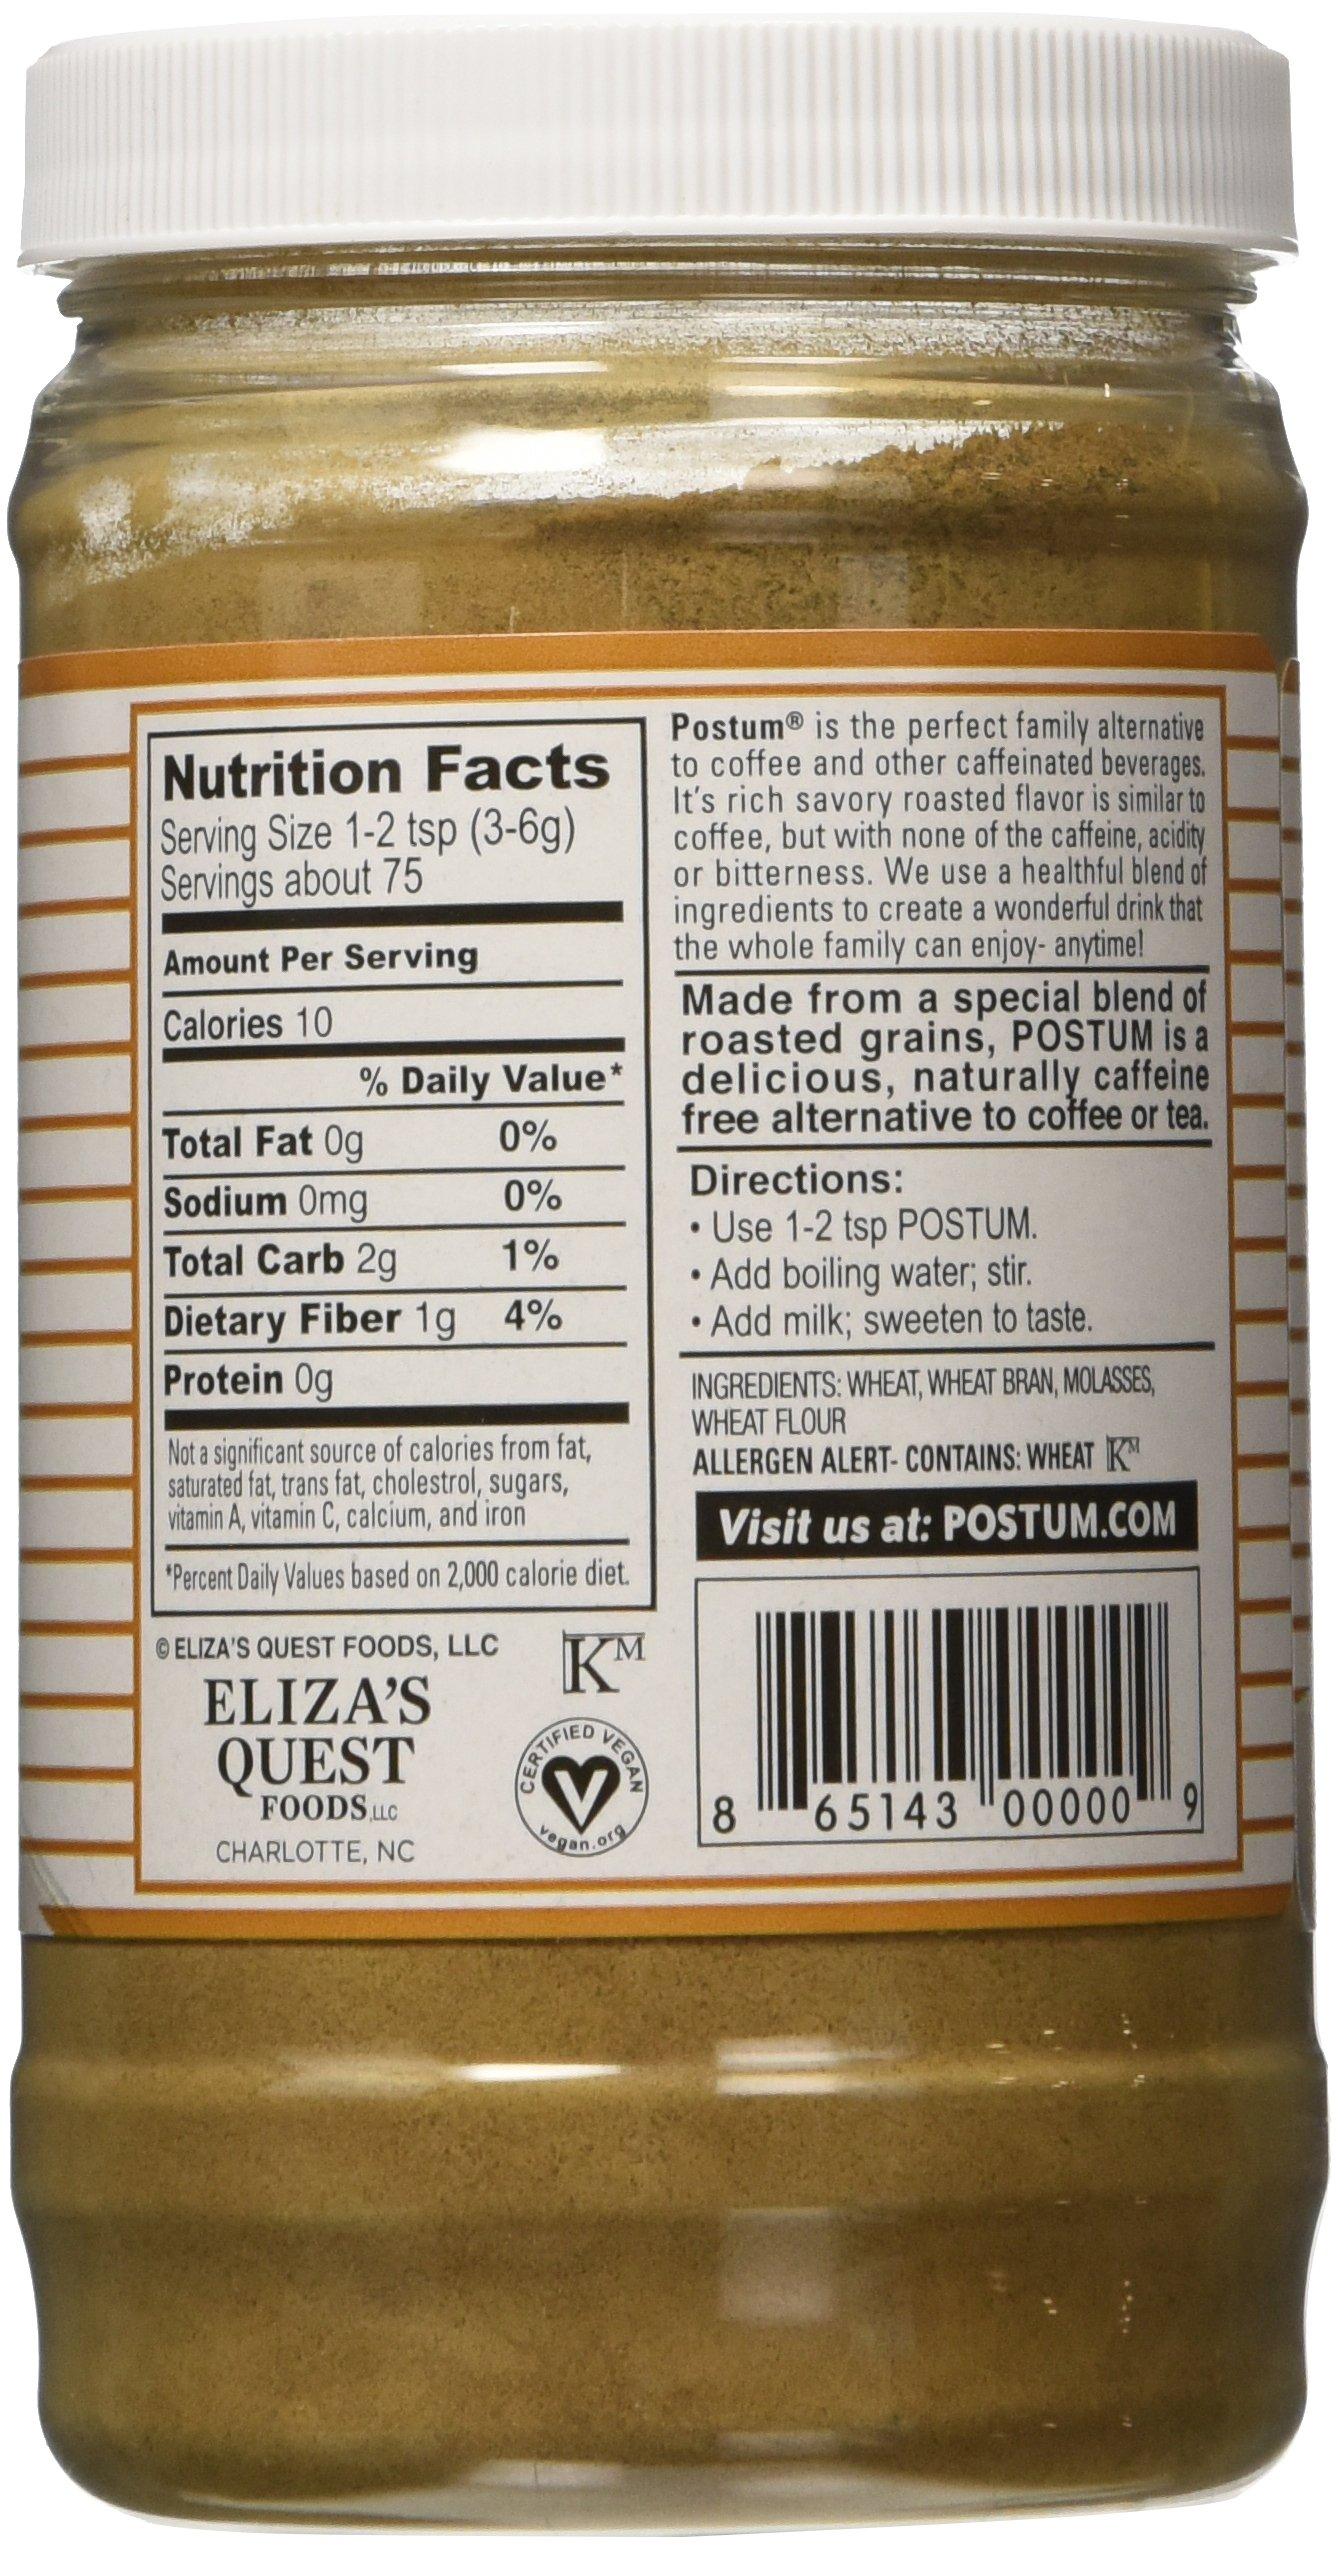 Postum 8 Oz. Roasted Wheat-Bran & Molasses Instant Warm Beverage, Pack of 12 by Postum (Image #4)